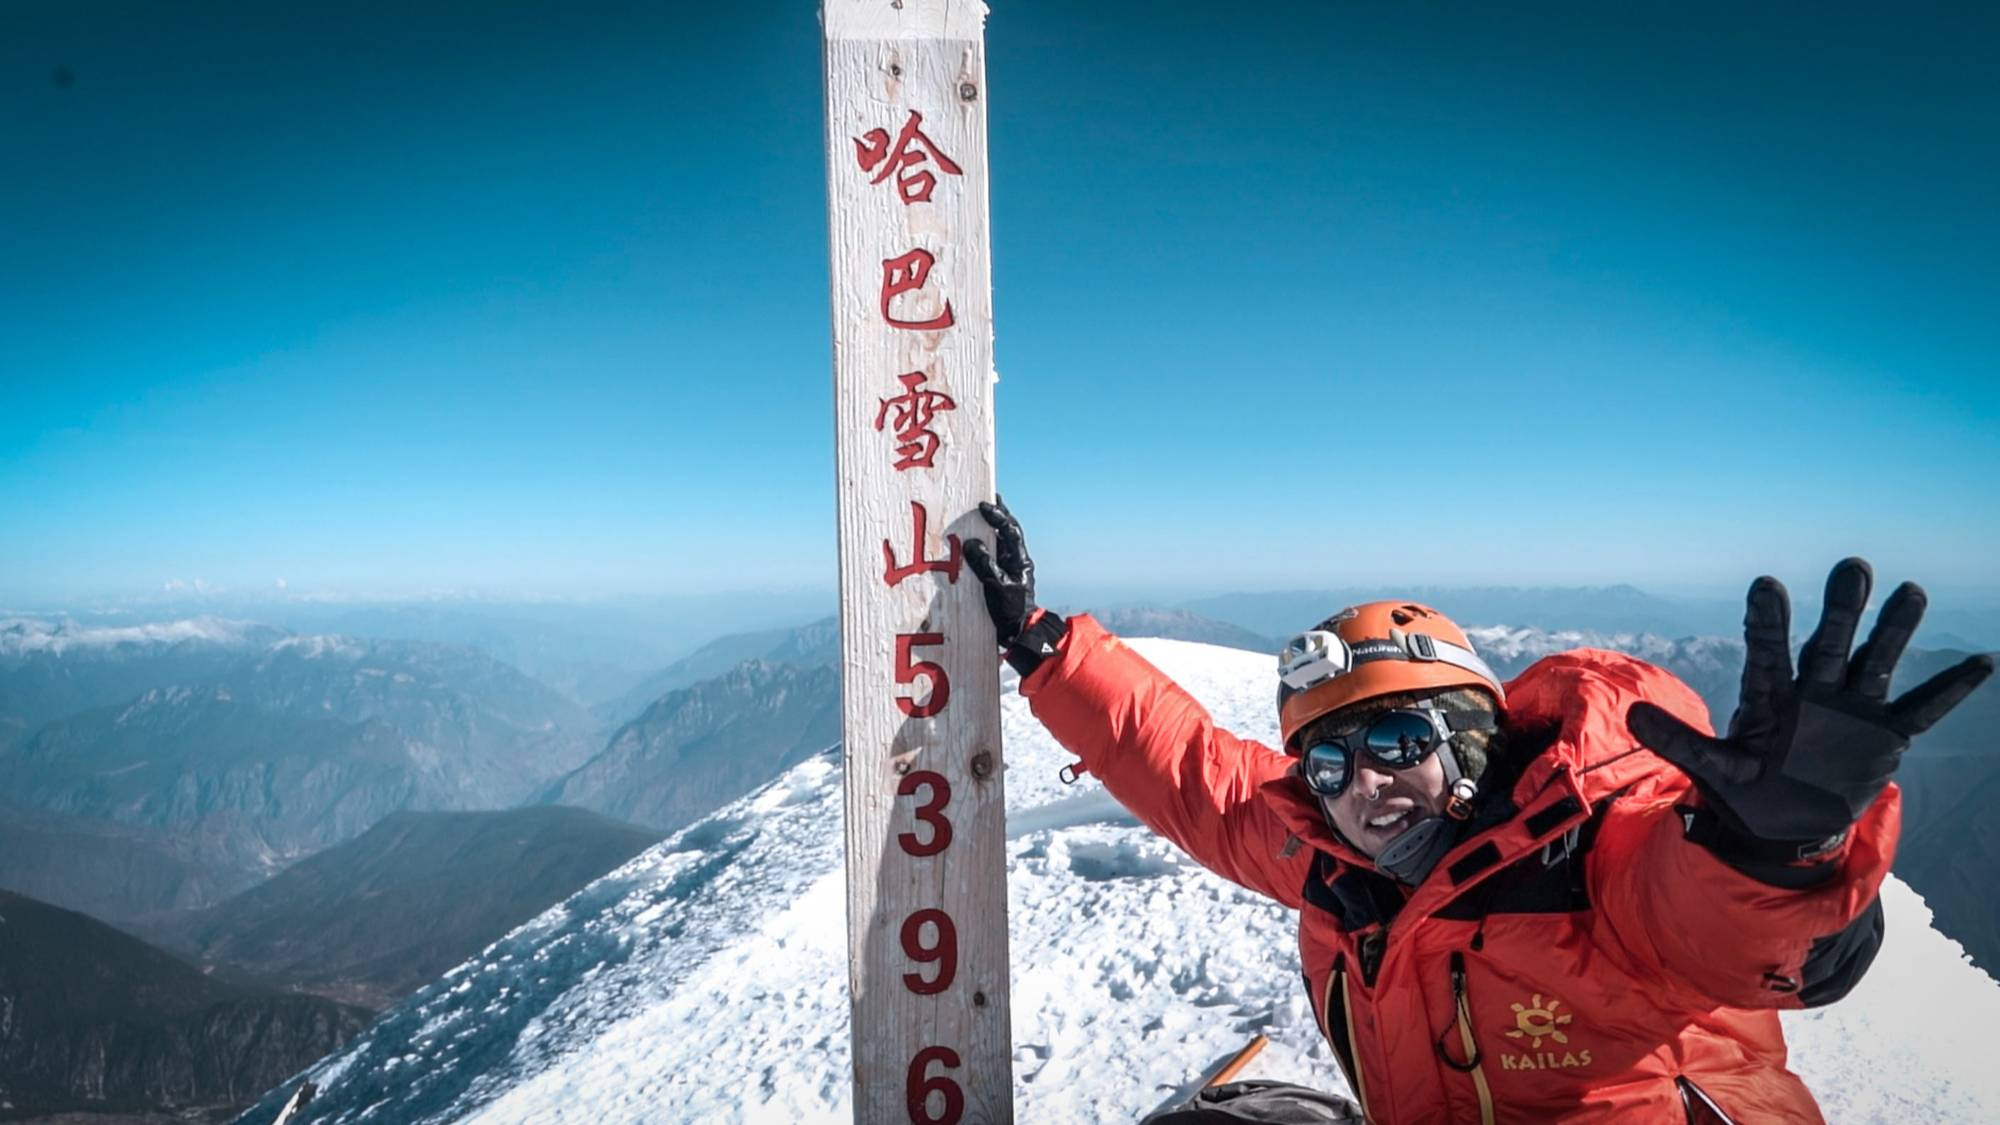 【A站首发】探寻高原秘境 | 攀登向前,登顶哈巴雪山!